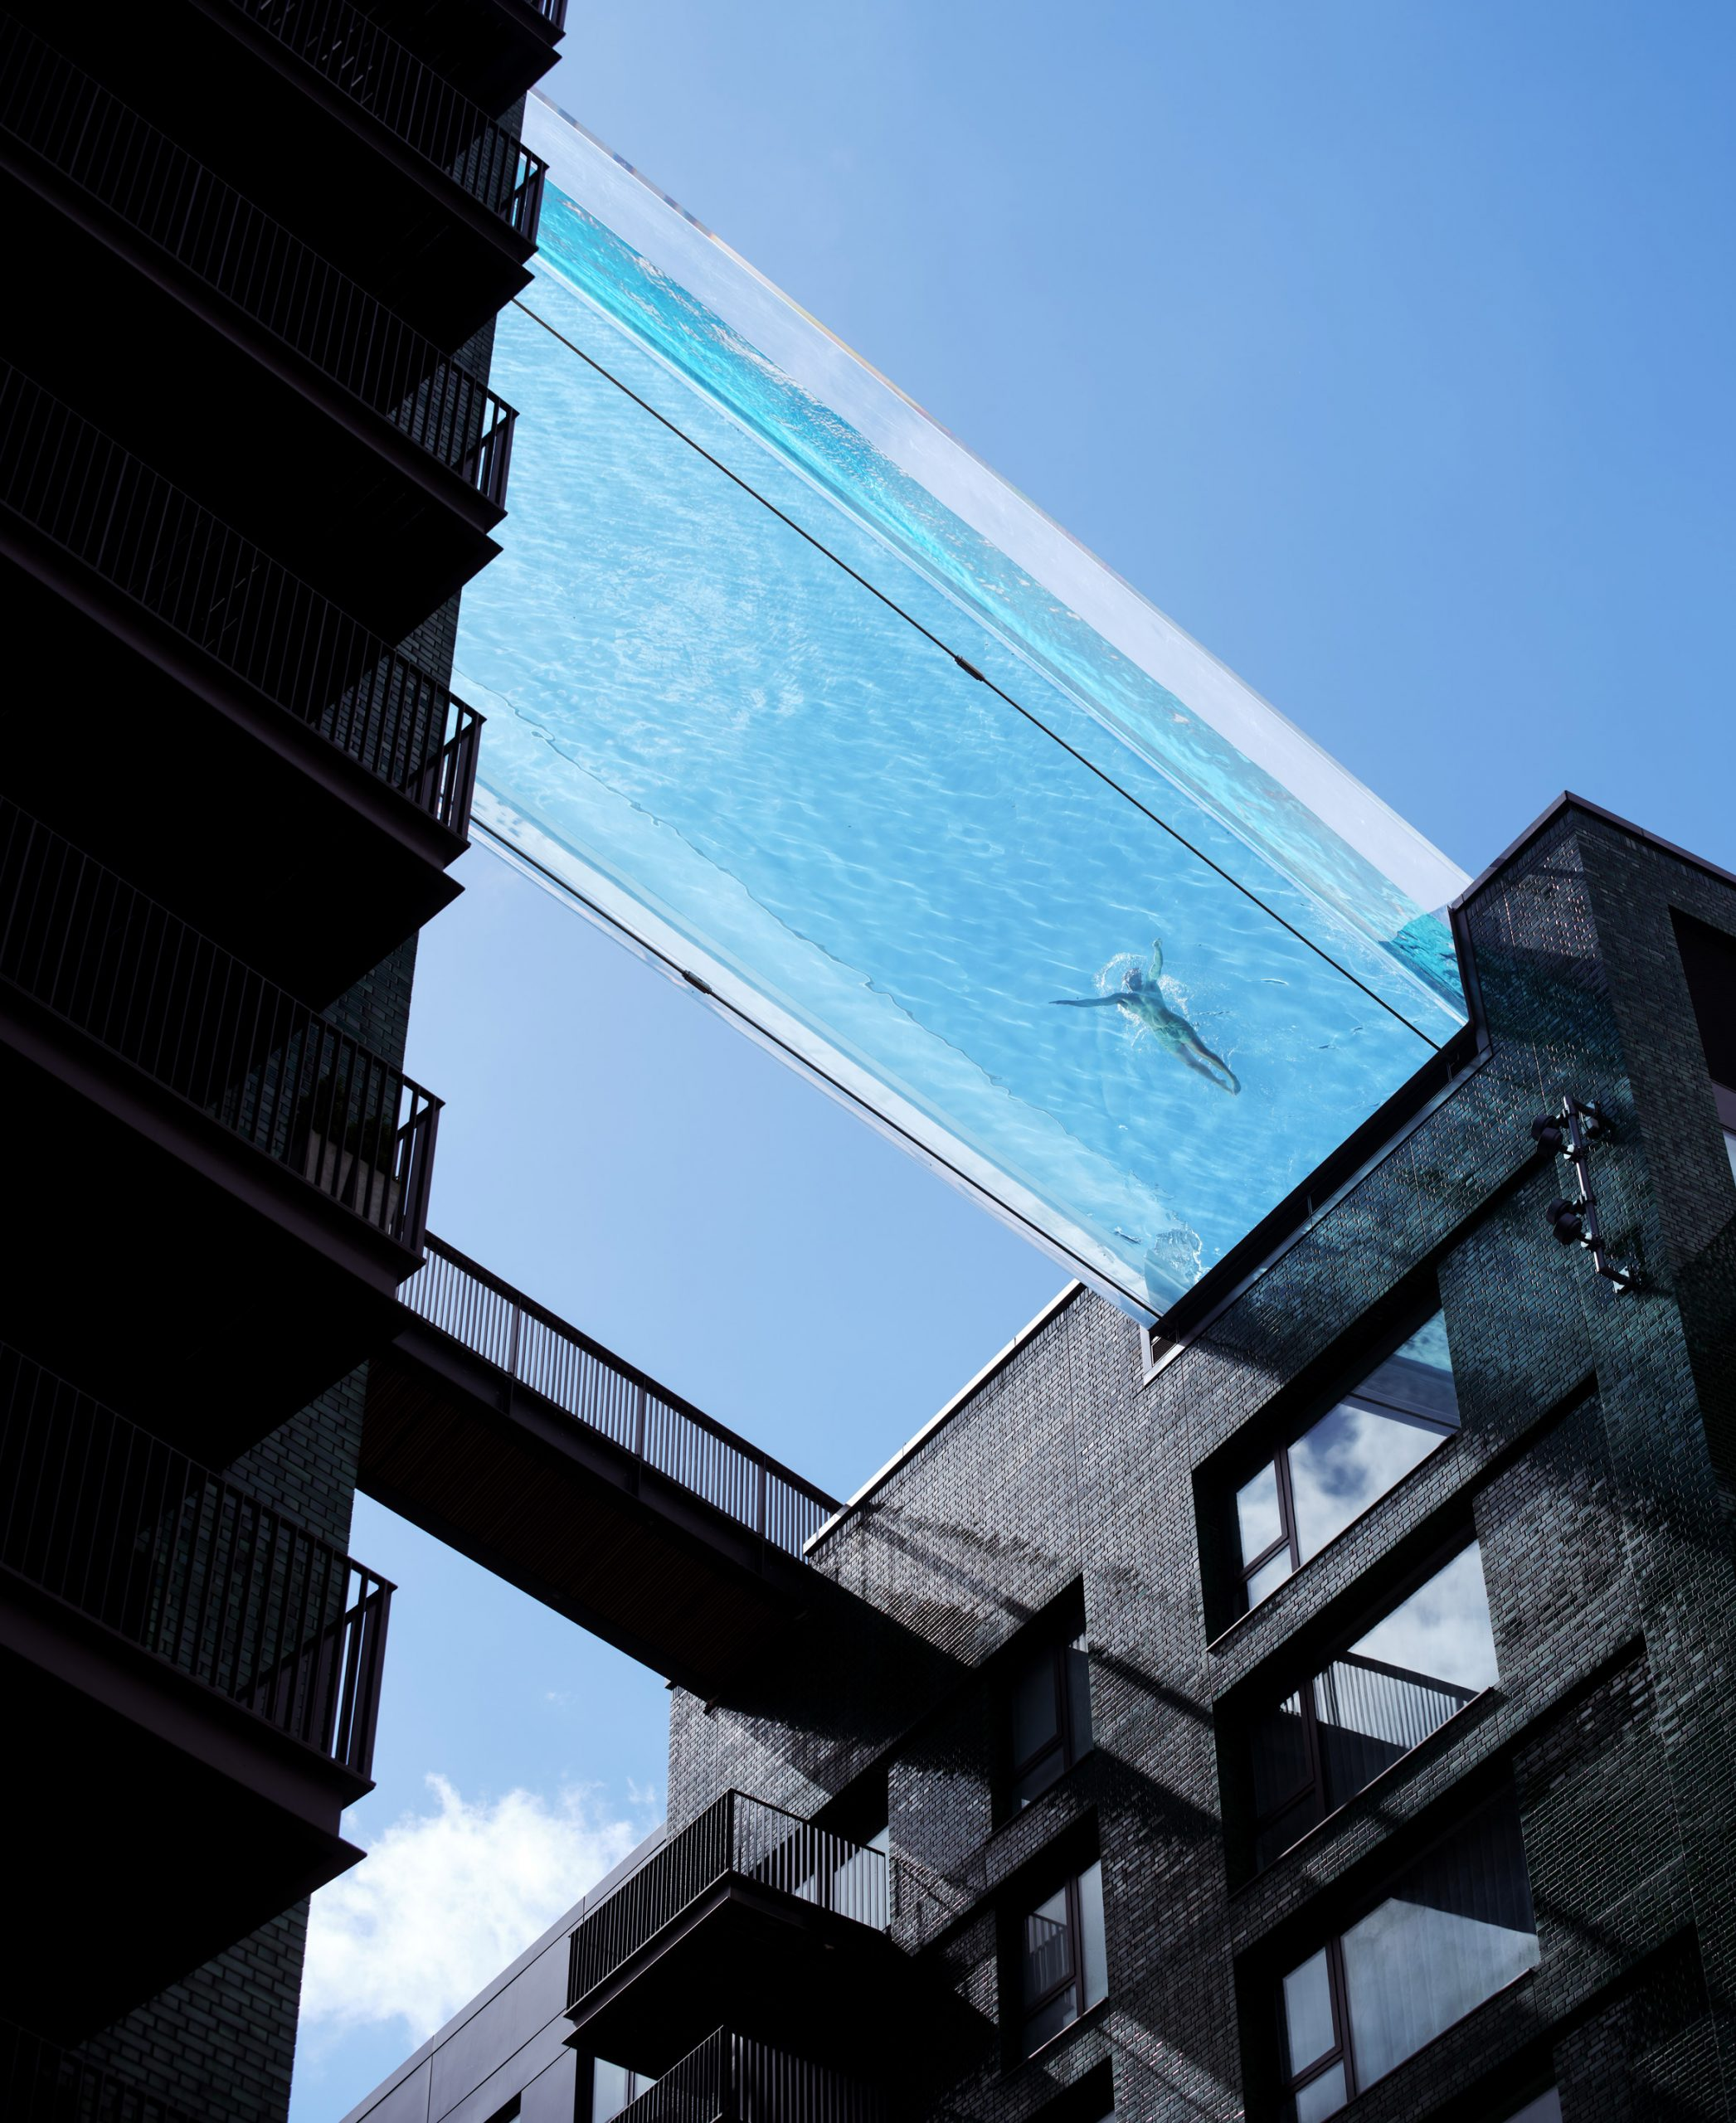 sky-pool-embassy-gardens-ecoworld-ballymore-nine-elms-london-battersea_dezeen_2364_col_3-scaled